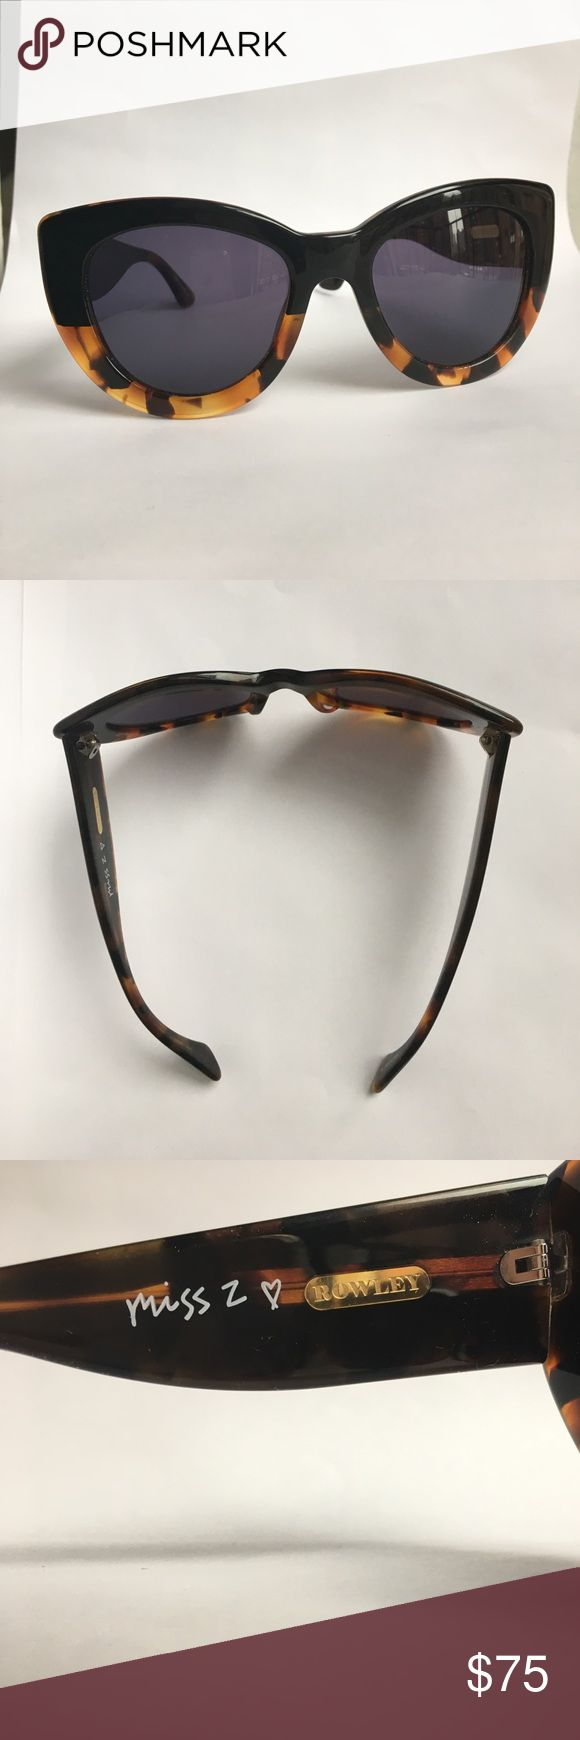 Cynthia Rowley Miss Z black/tortoise sunglasses Originally $100. Cat-eye acetate sunnies. Designed by Zosia Mamet for Cynthia Rowley. Black/tortoise color. Cynthia Rowley Accessories Sunglasses